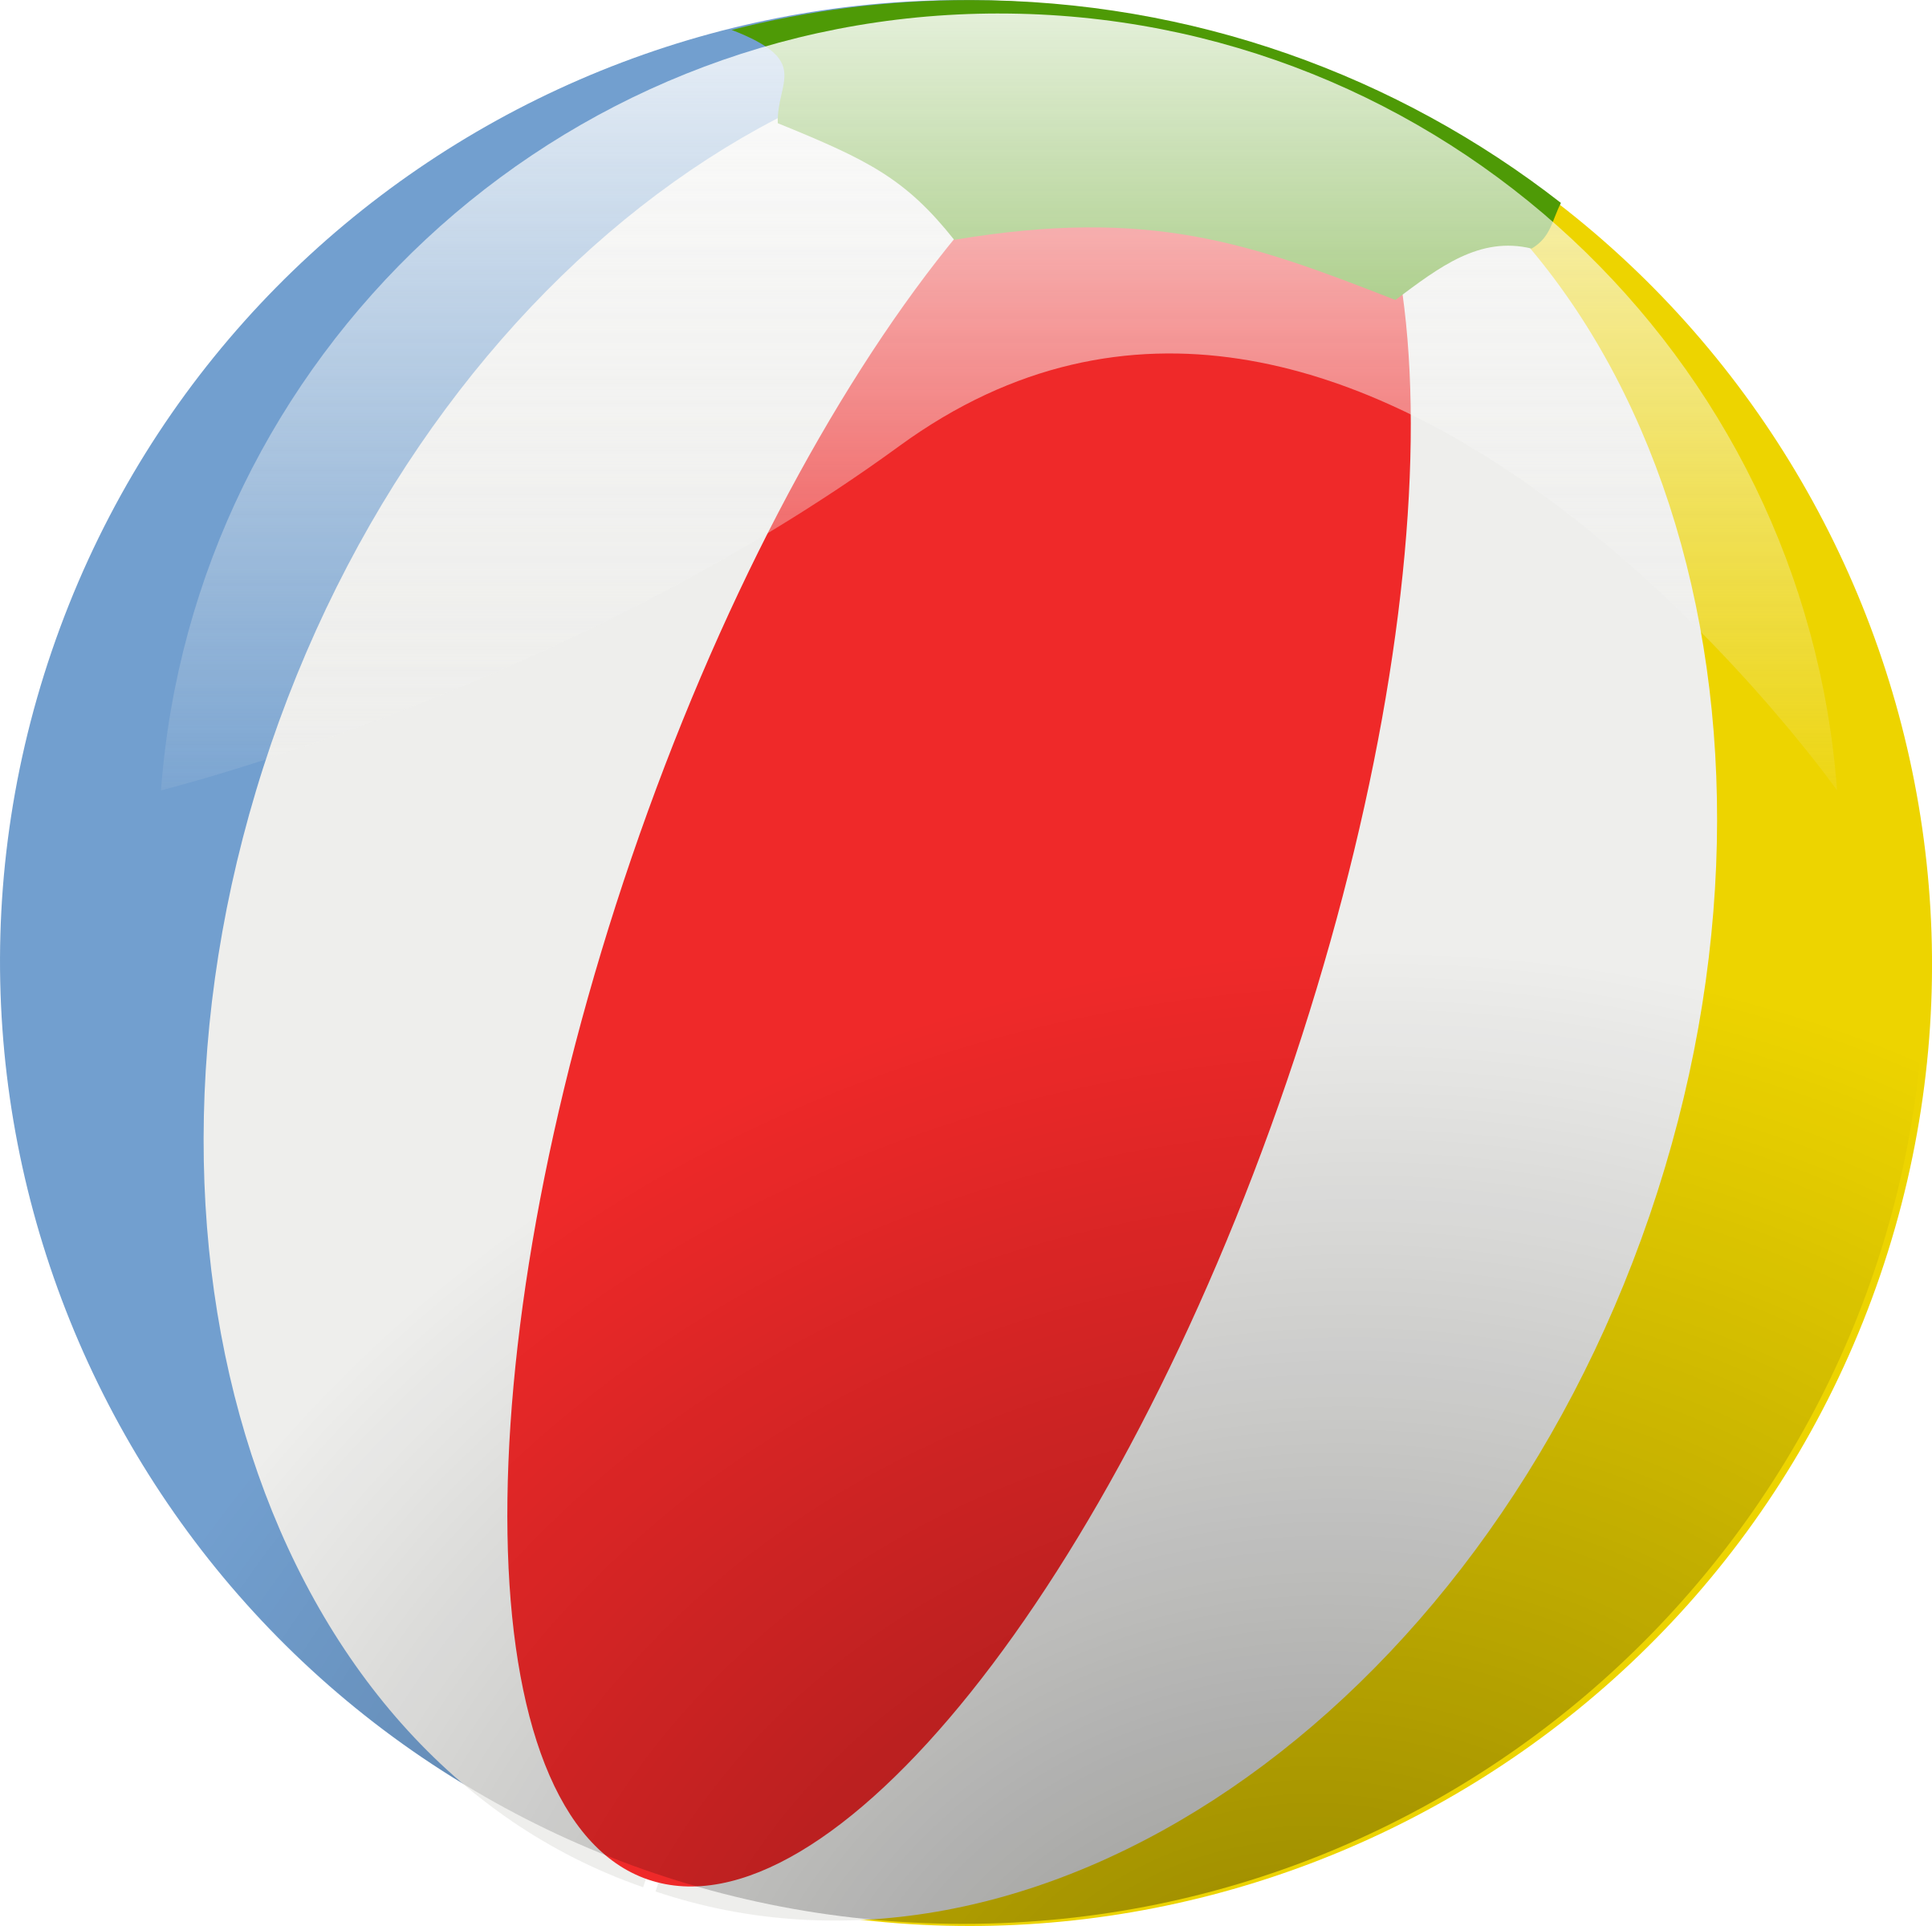 Beach ball png images. Beachball clipart transparent background